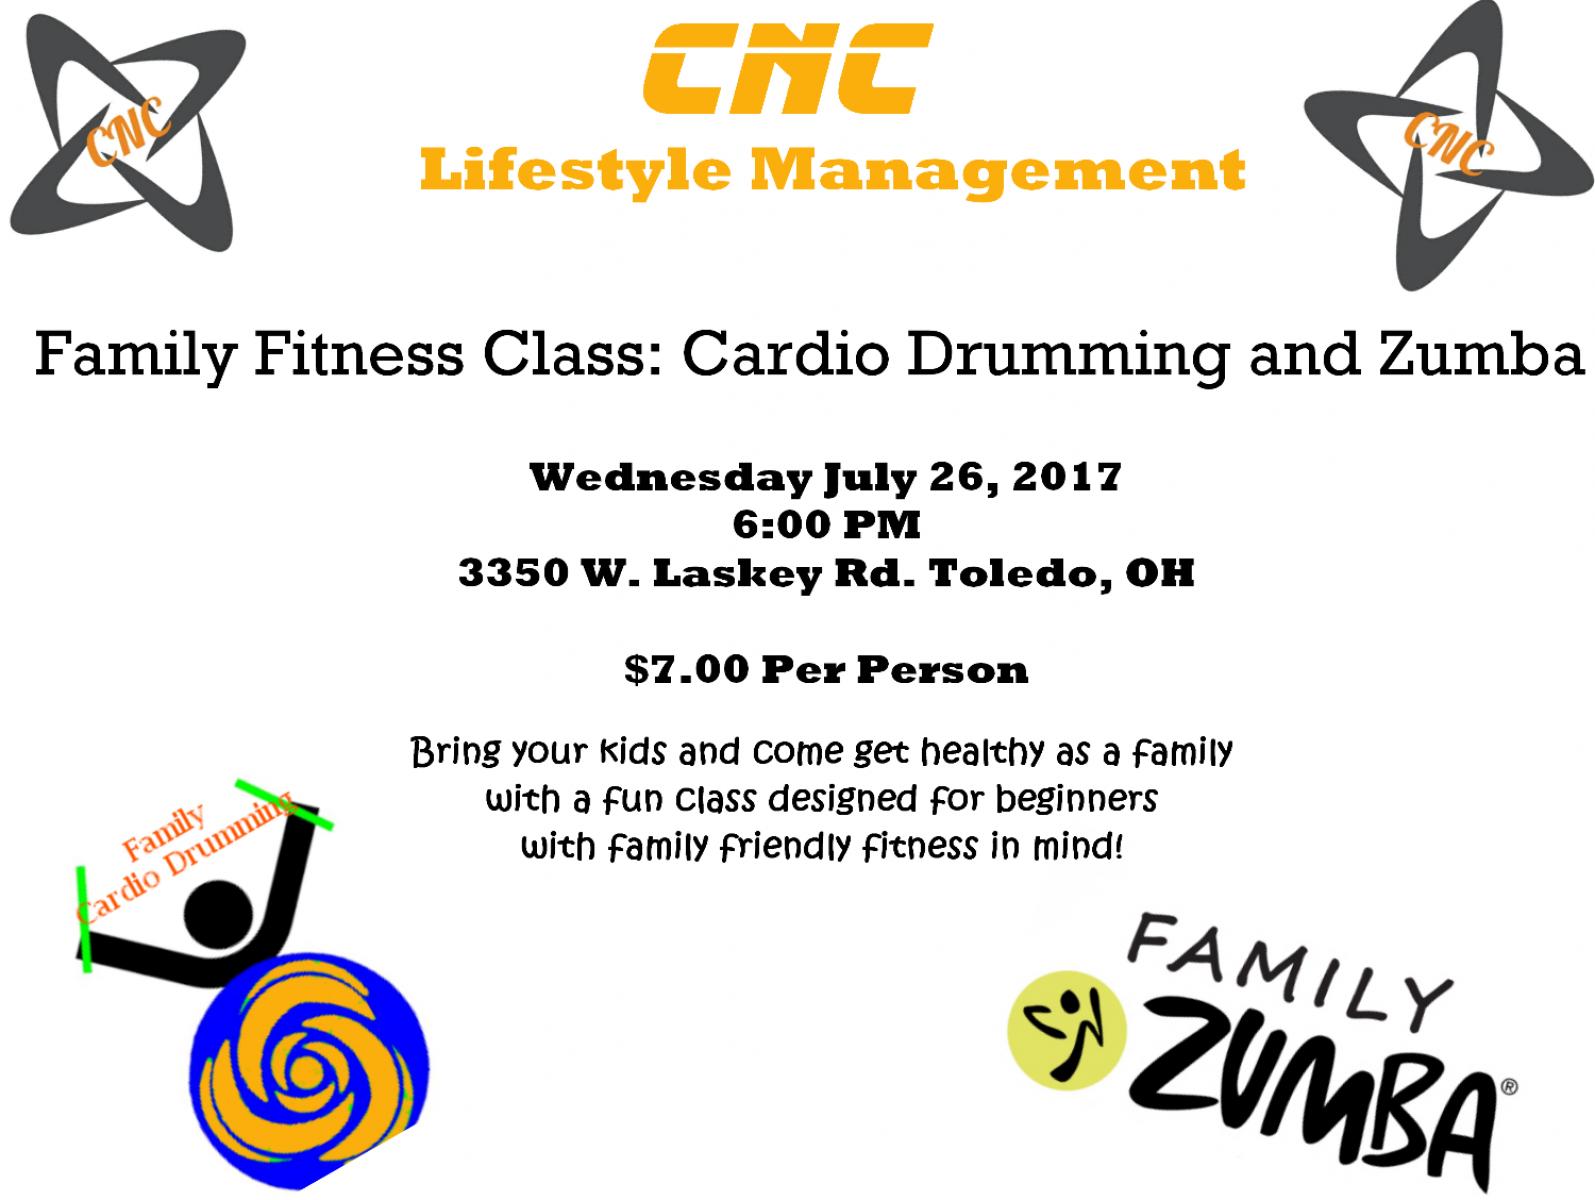 Family Friendly Cardio Drumming / Zumba Combo Class!